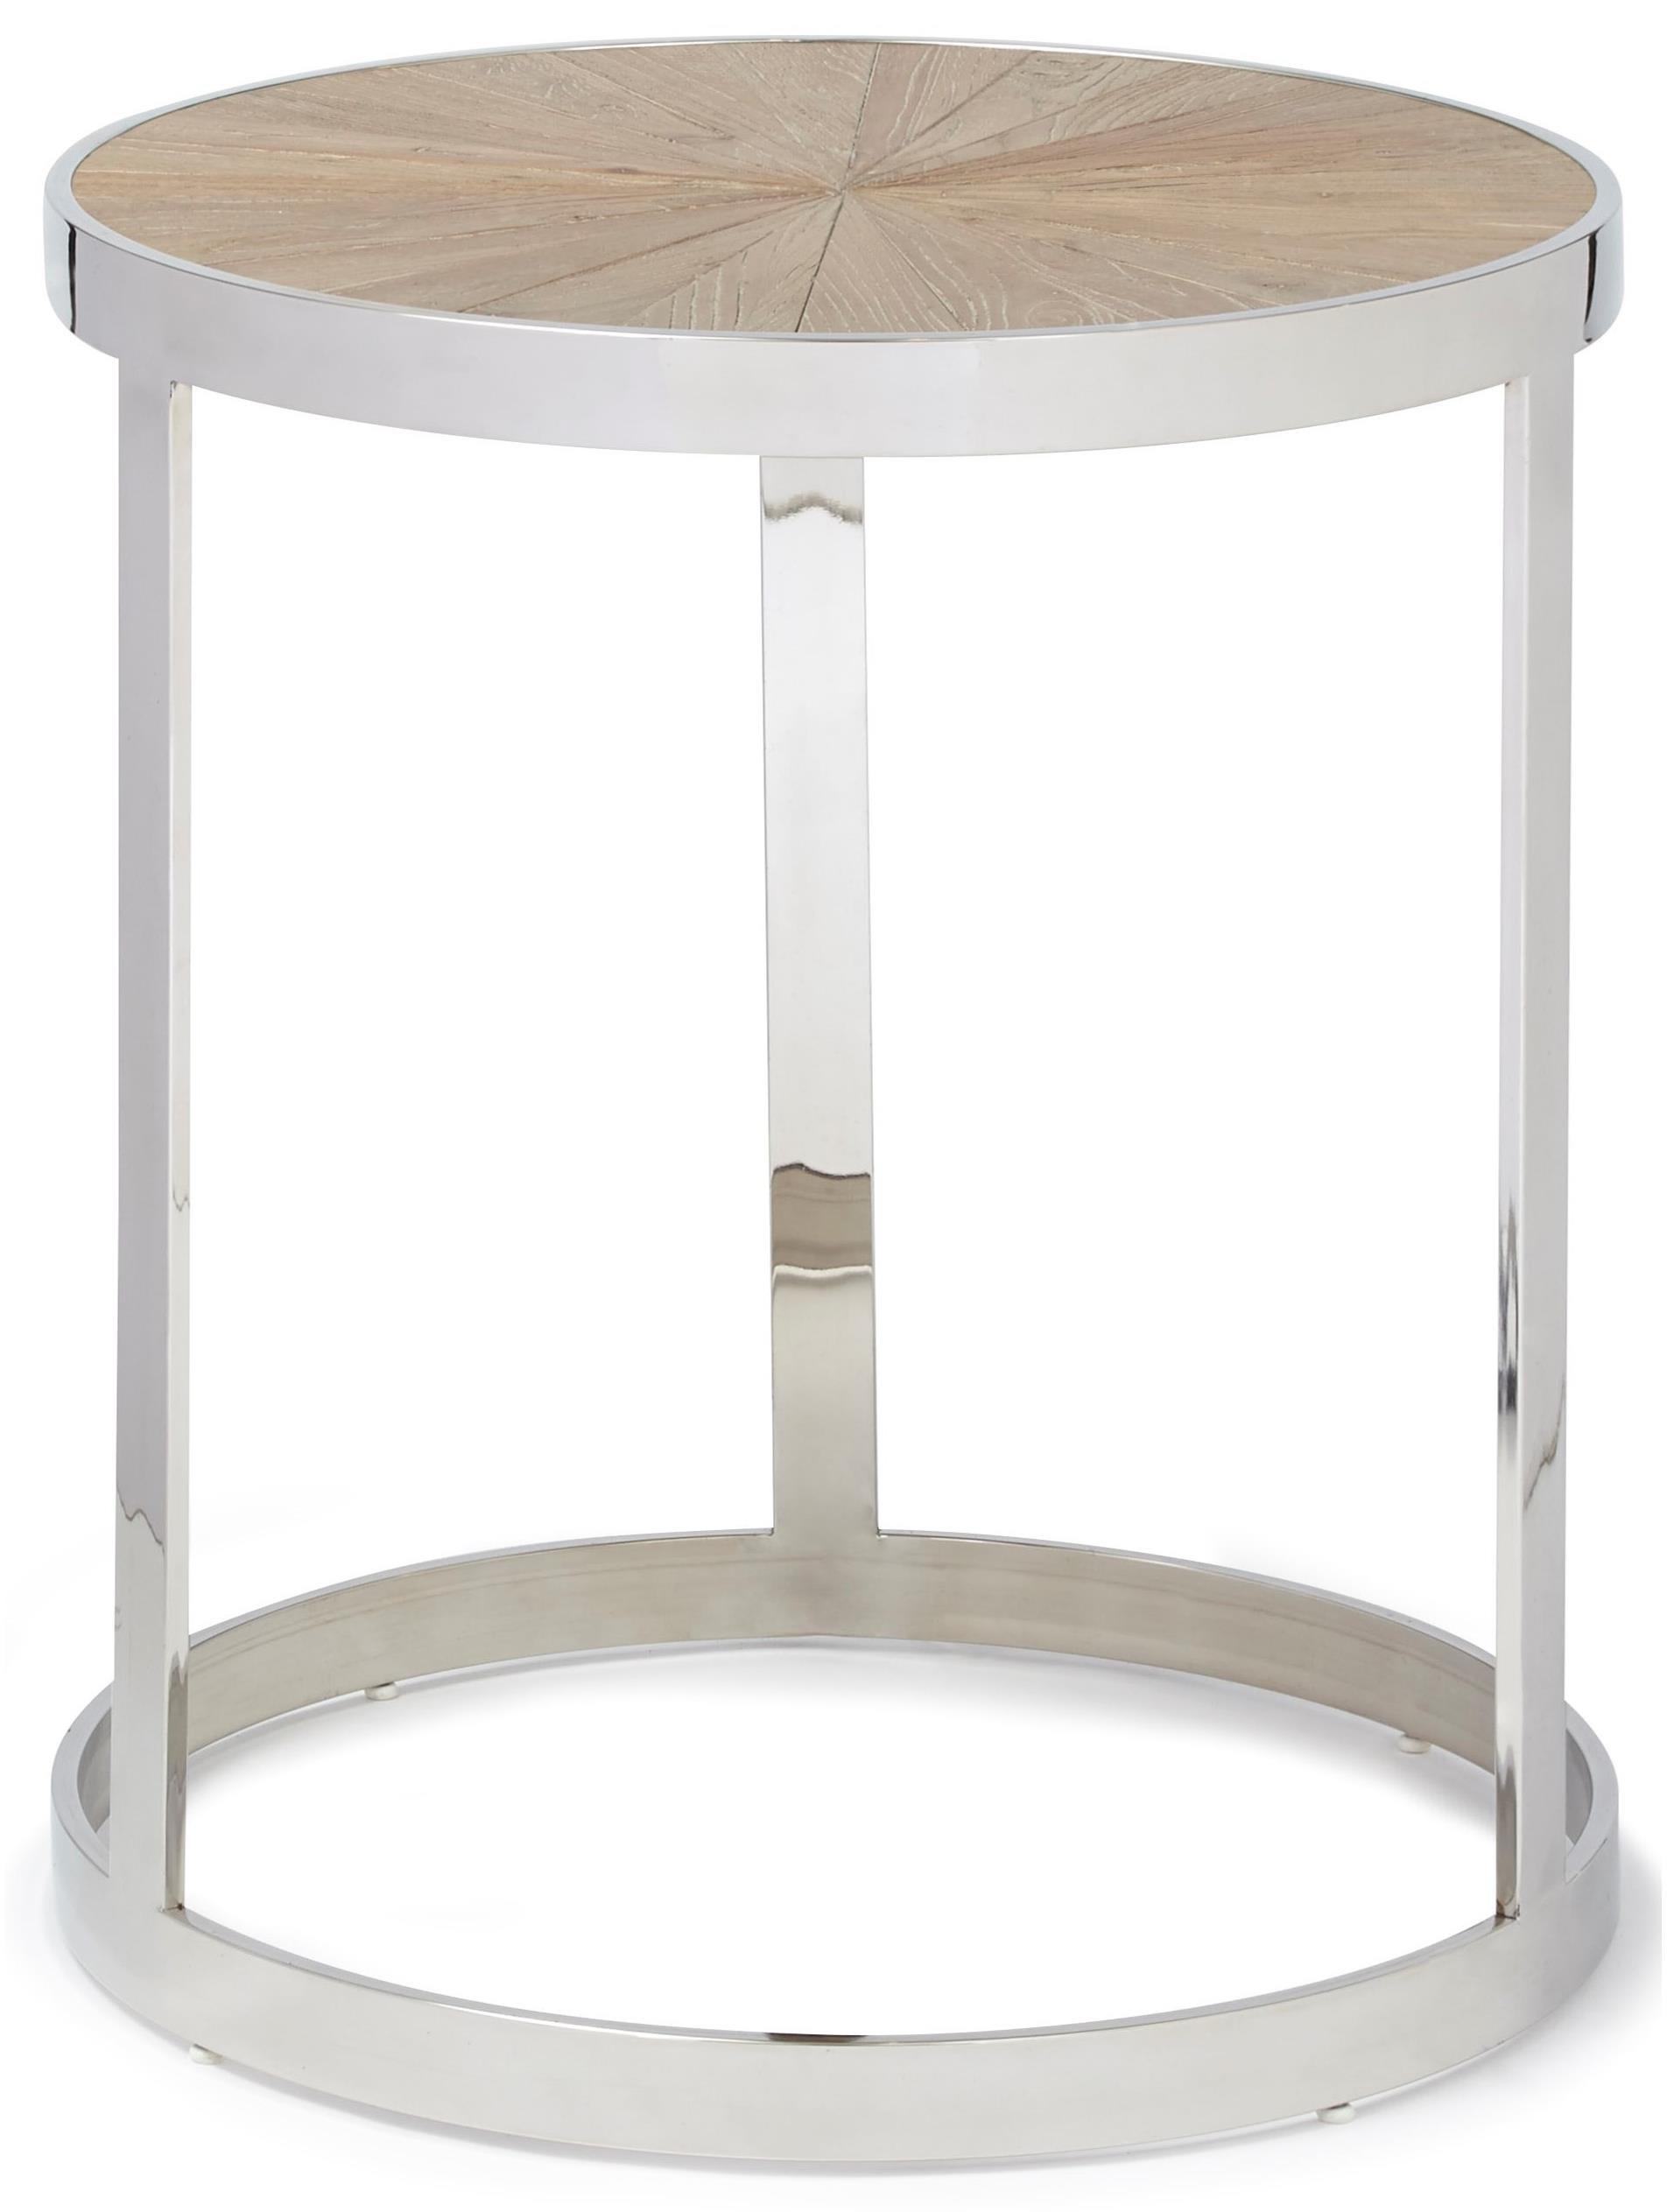 Progressive Furniture Oscar Reclaimed Elm/Chrome End Table